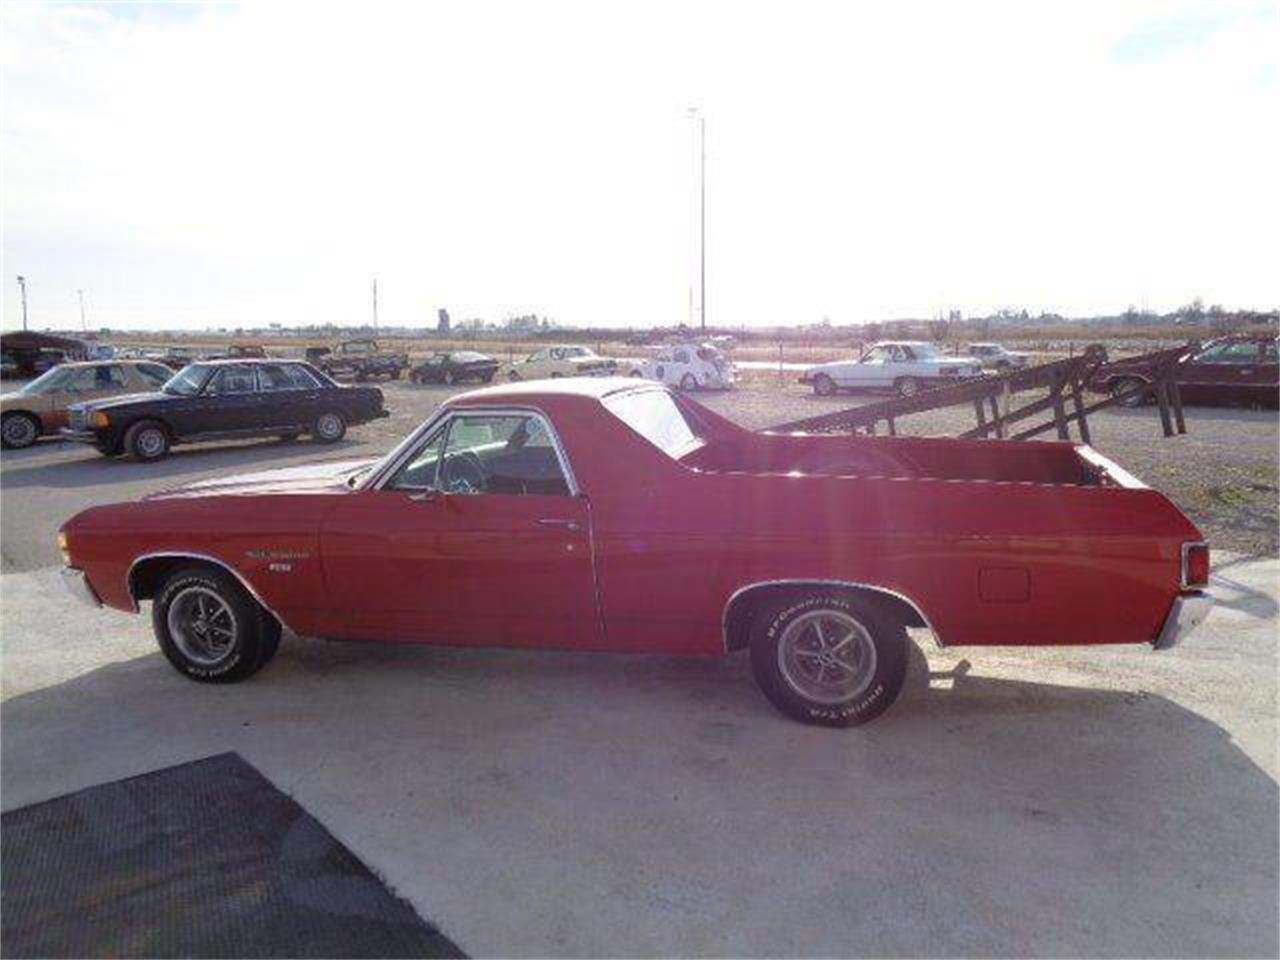 1971 Chevrolet El Camino (CC-1181488) for sale in Staunton, Illinois